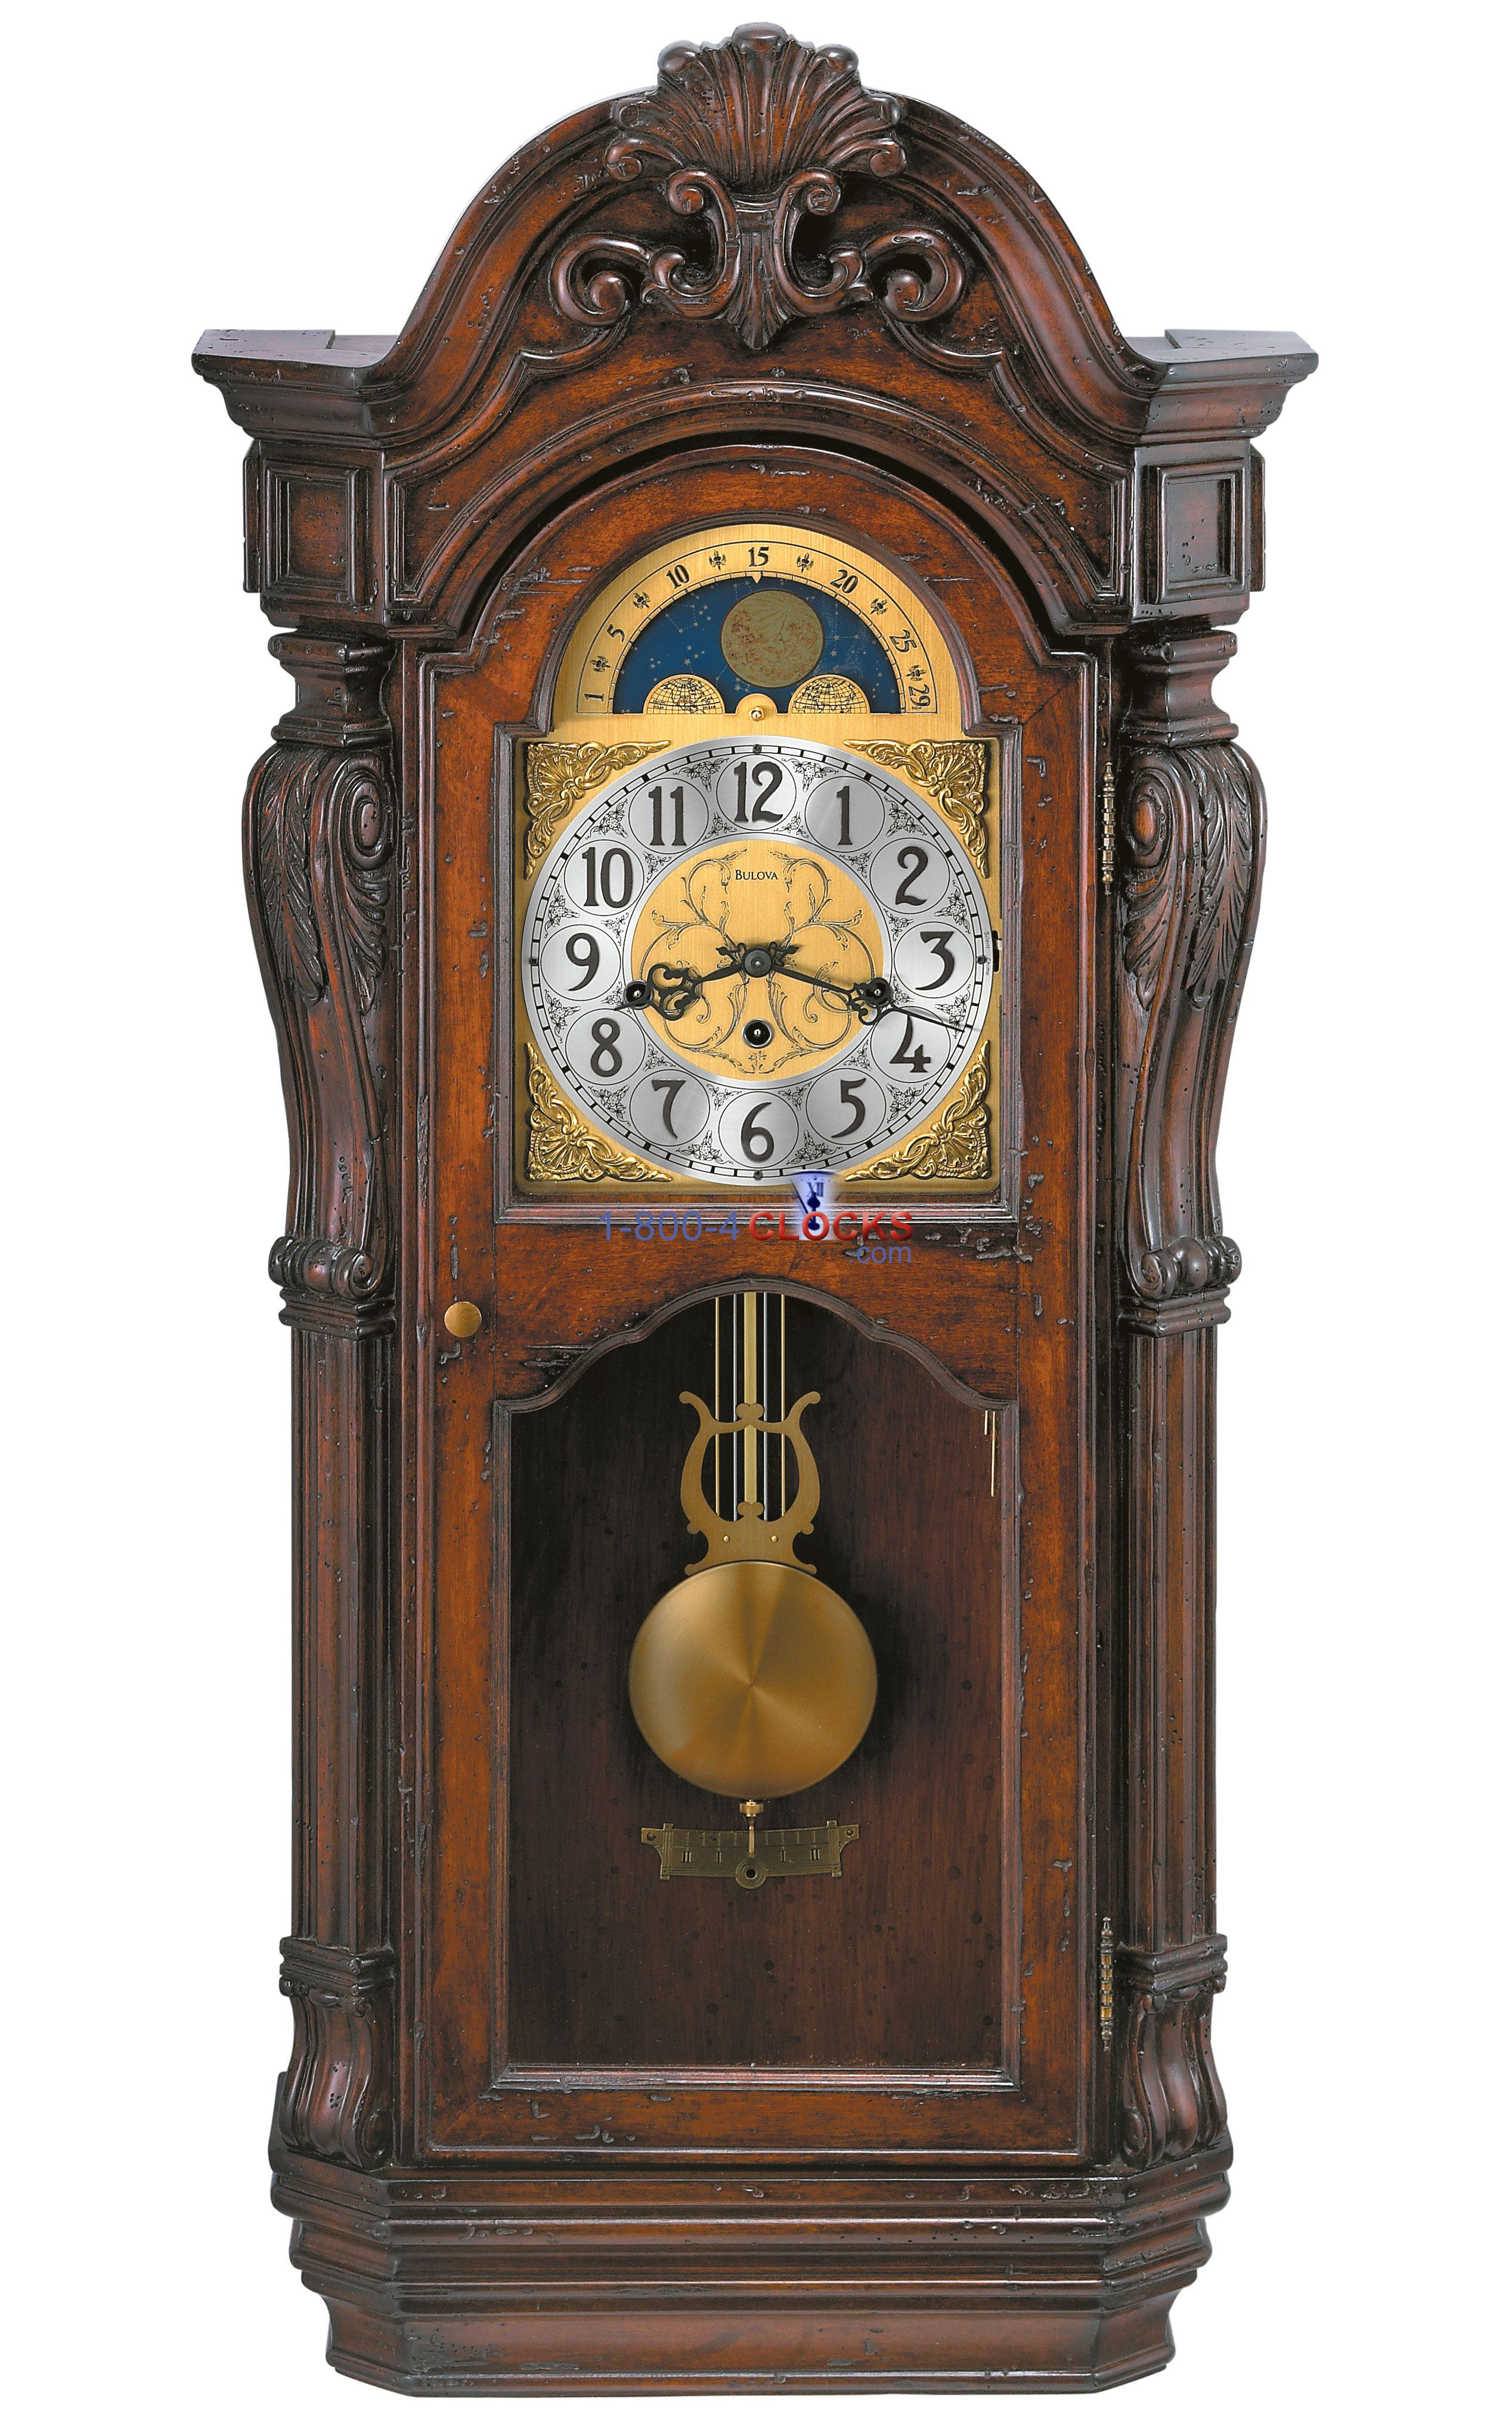 bulova canterbury wall clock grandfather clocks howard on wall clocks id=65169